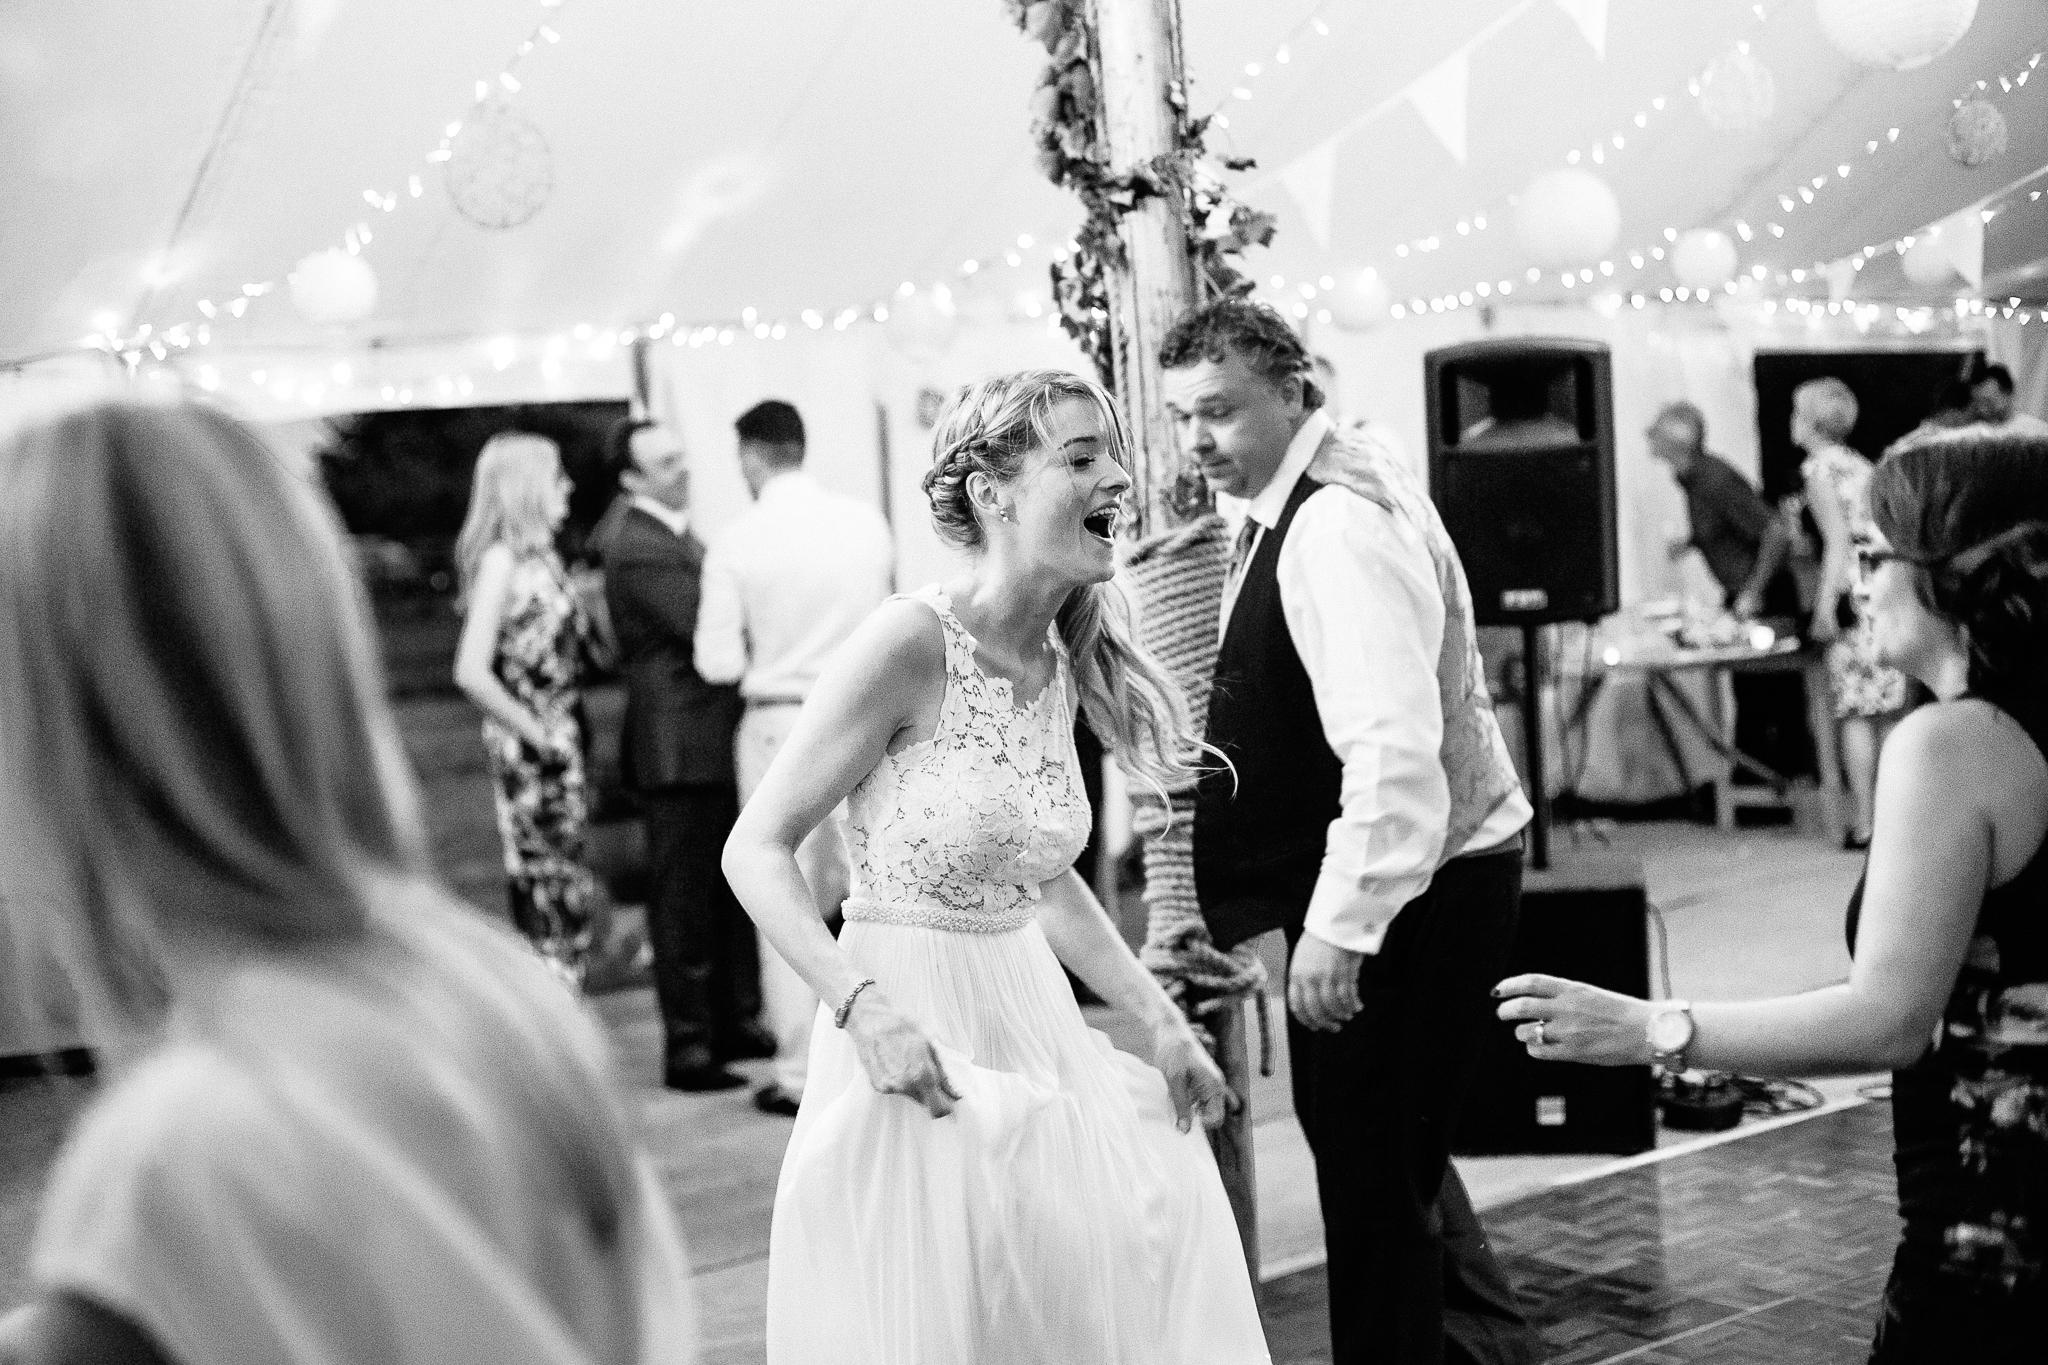 grantham_wedding_photographer-115.jpg